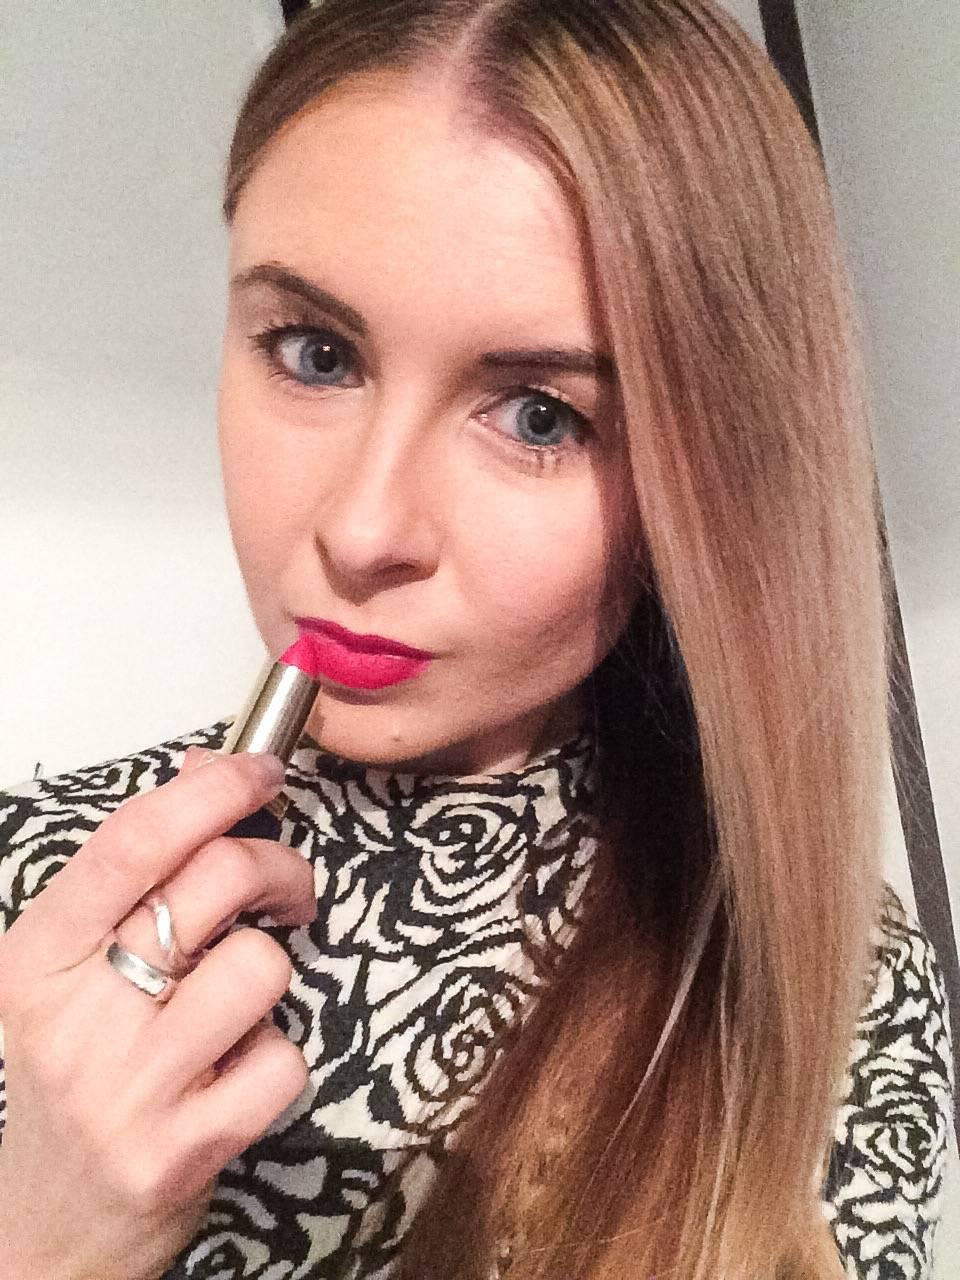 blake lively revlon lipstick